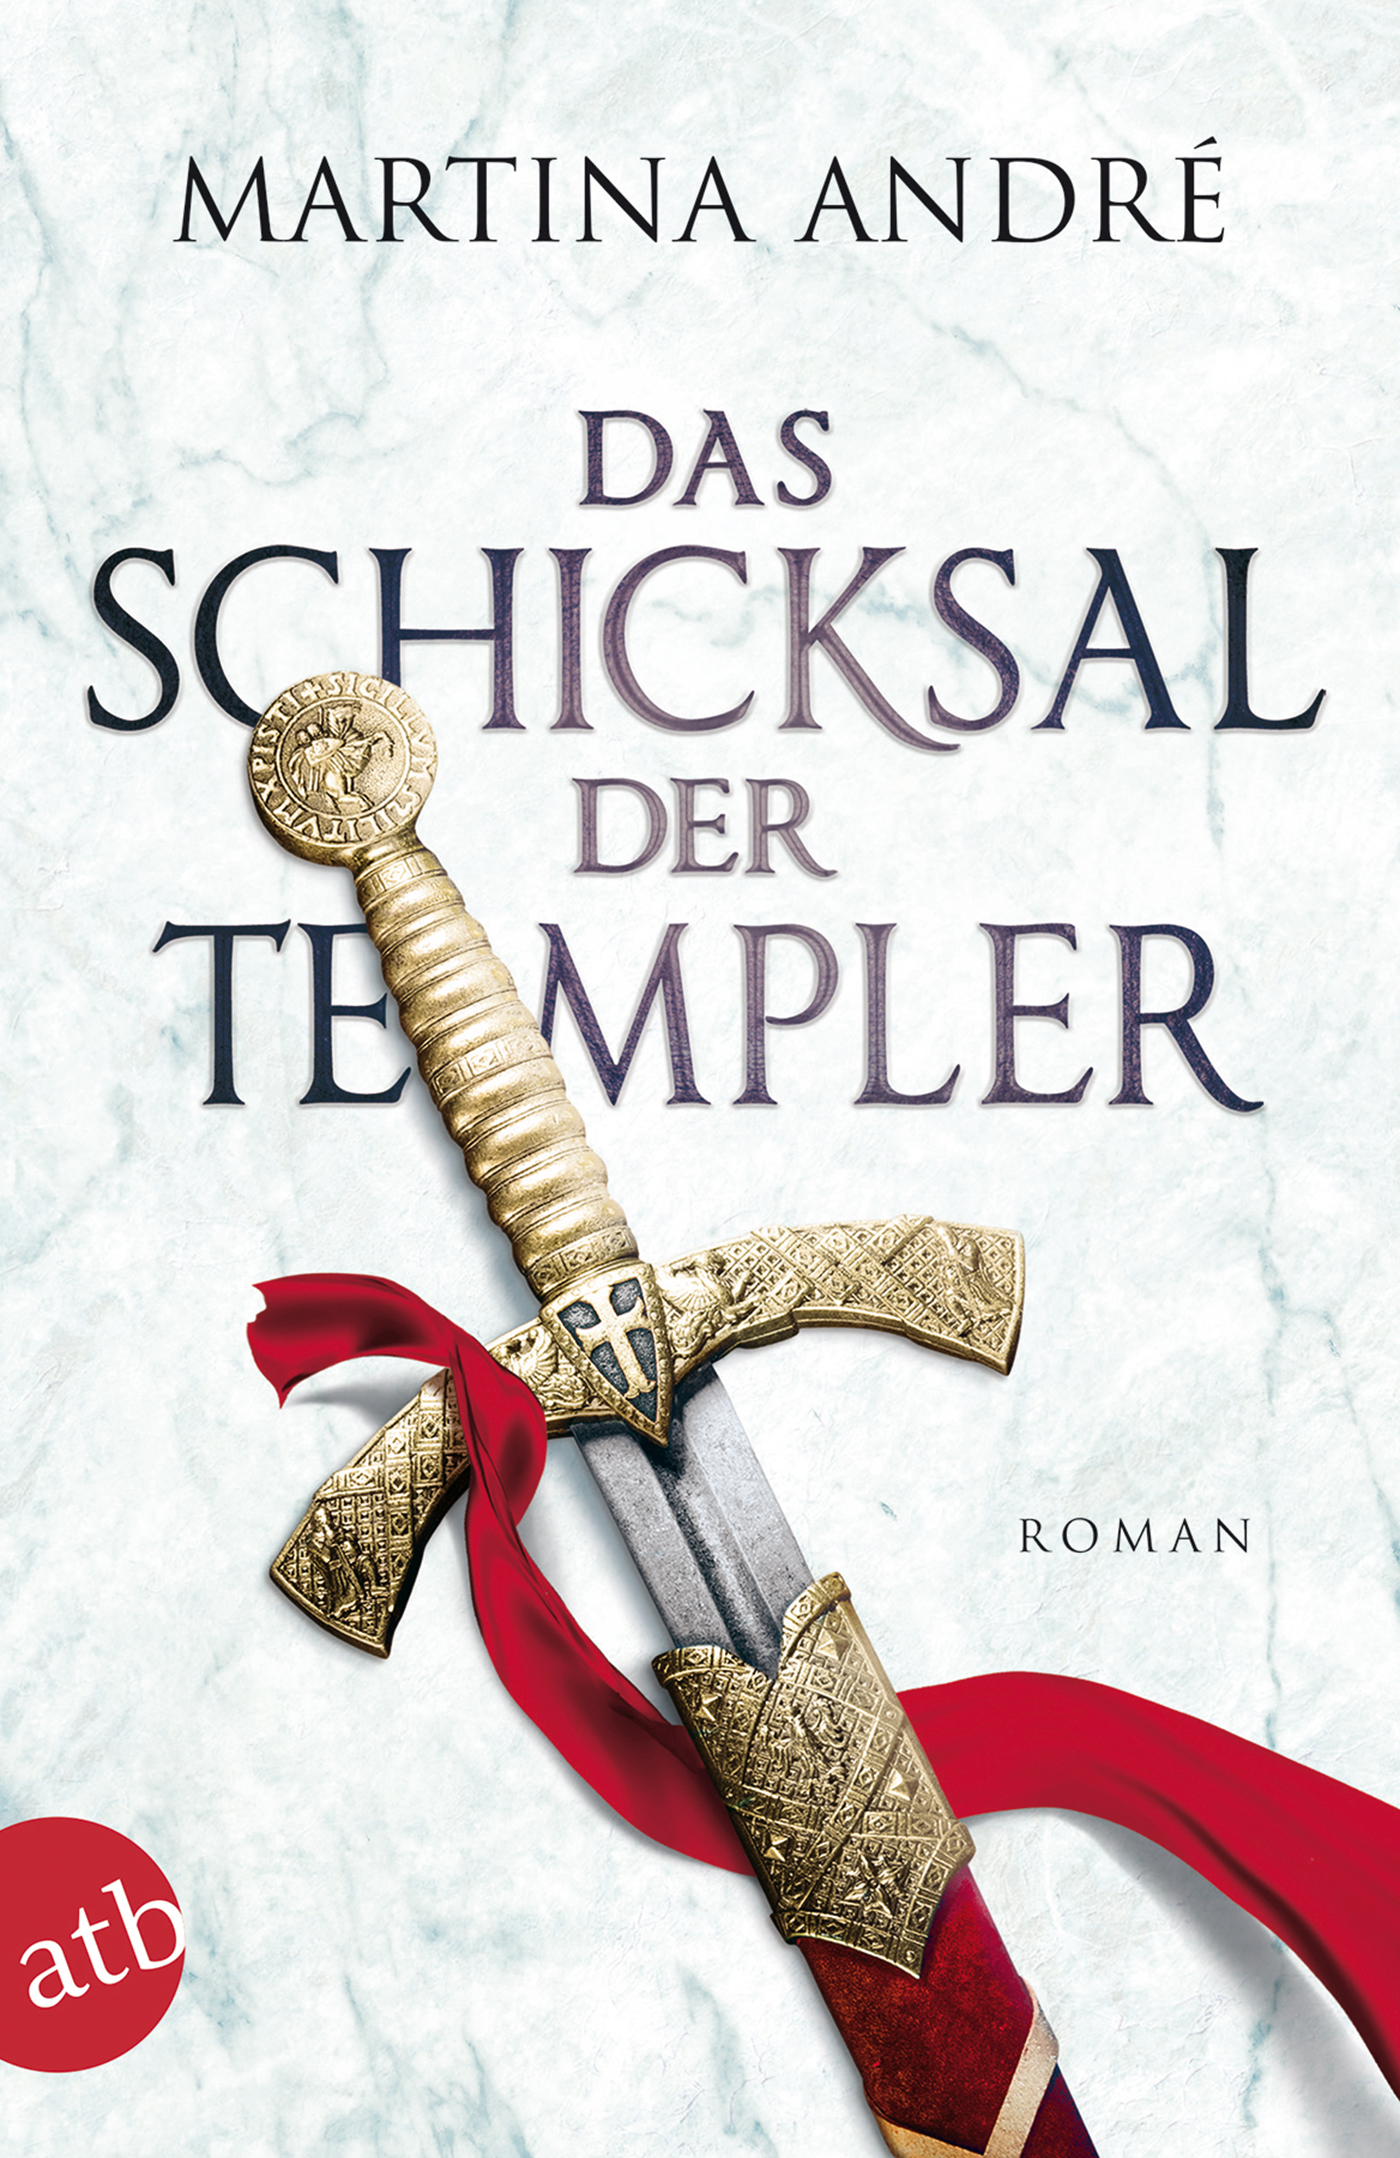 Das-Schicksal-der-Templer-Martina-Andre